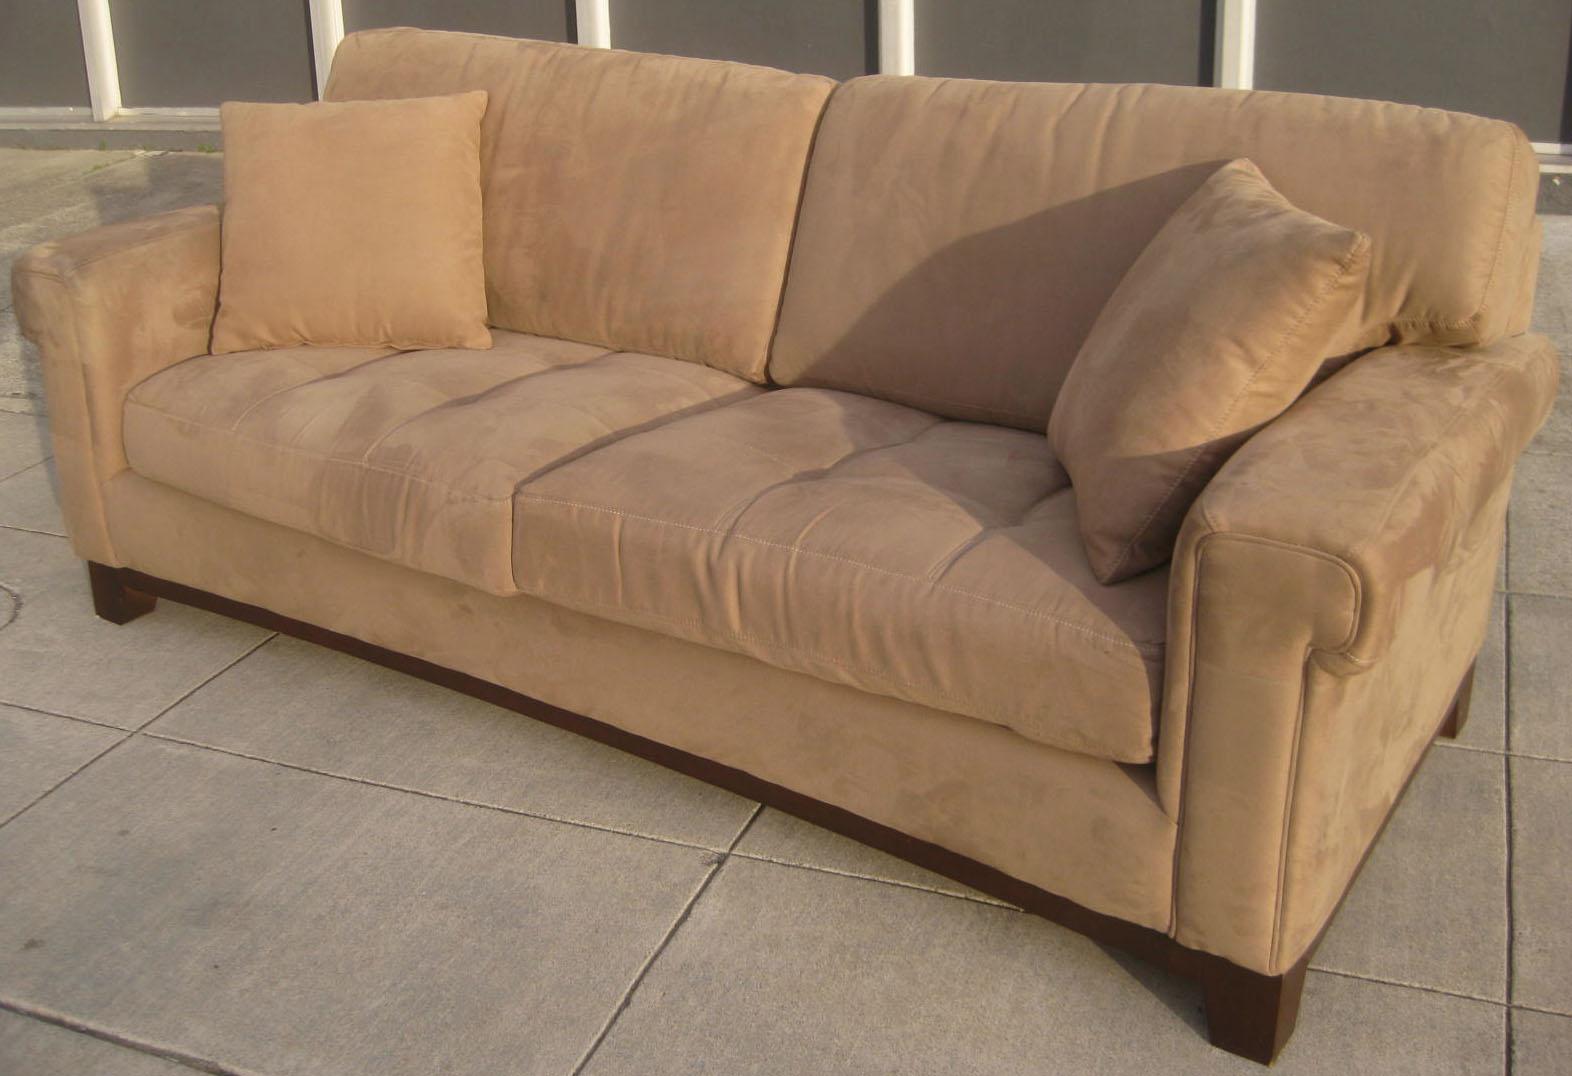 Greatest UHURU FURNITURE & COLLECTIBLES: SOLD - Tan Microsuede Sofa - $210 LG52